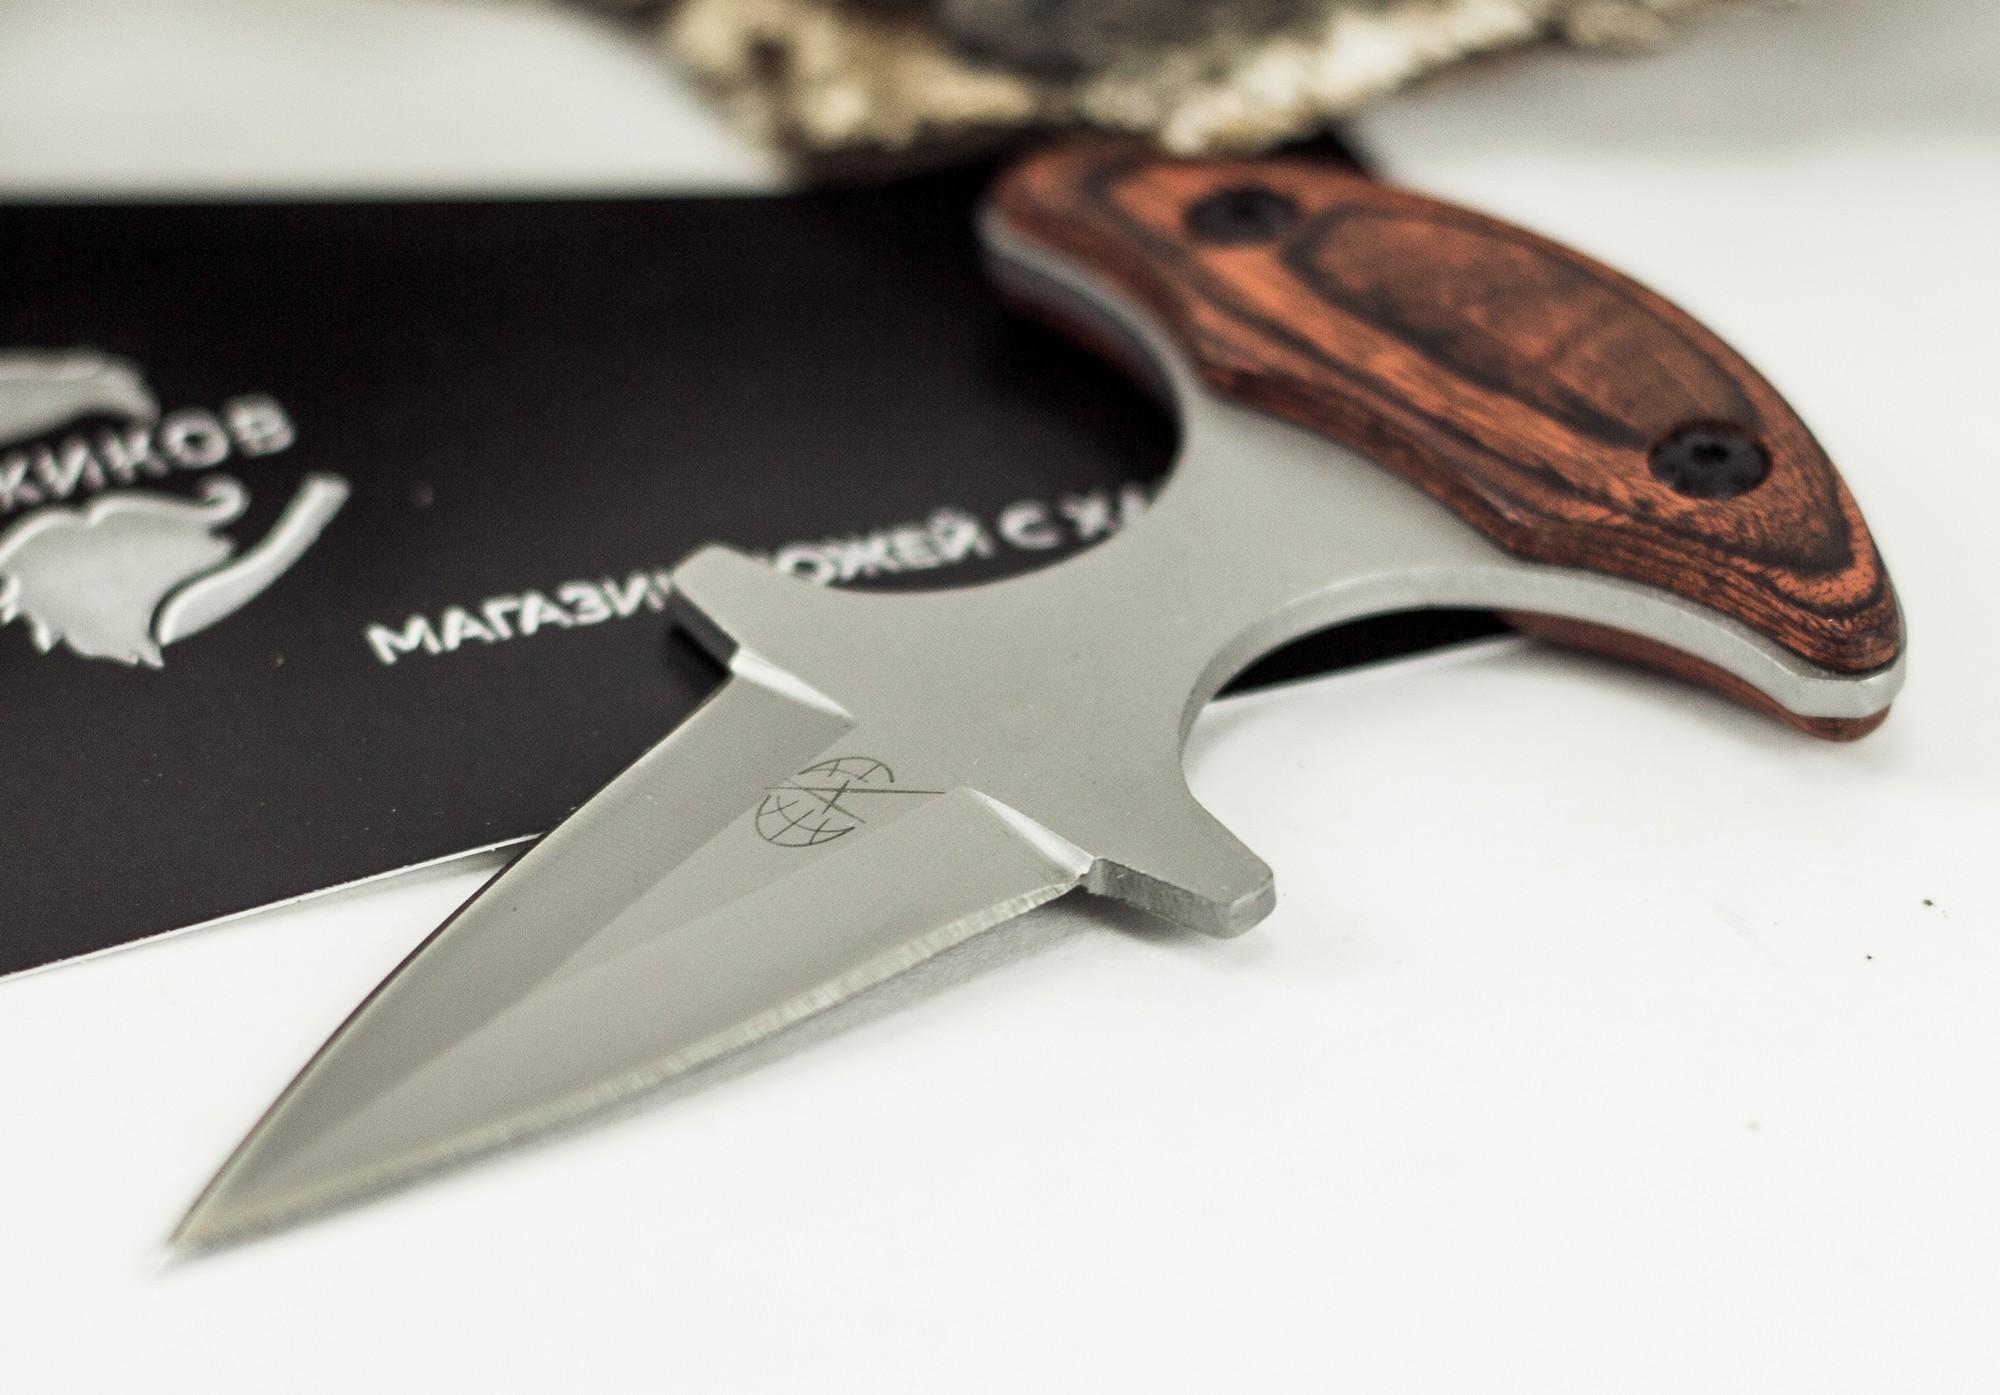 Фото 2 - Тычковый нож F907 от Pirat